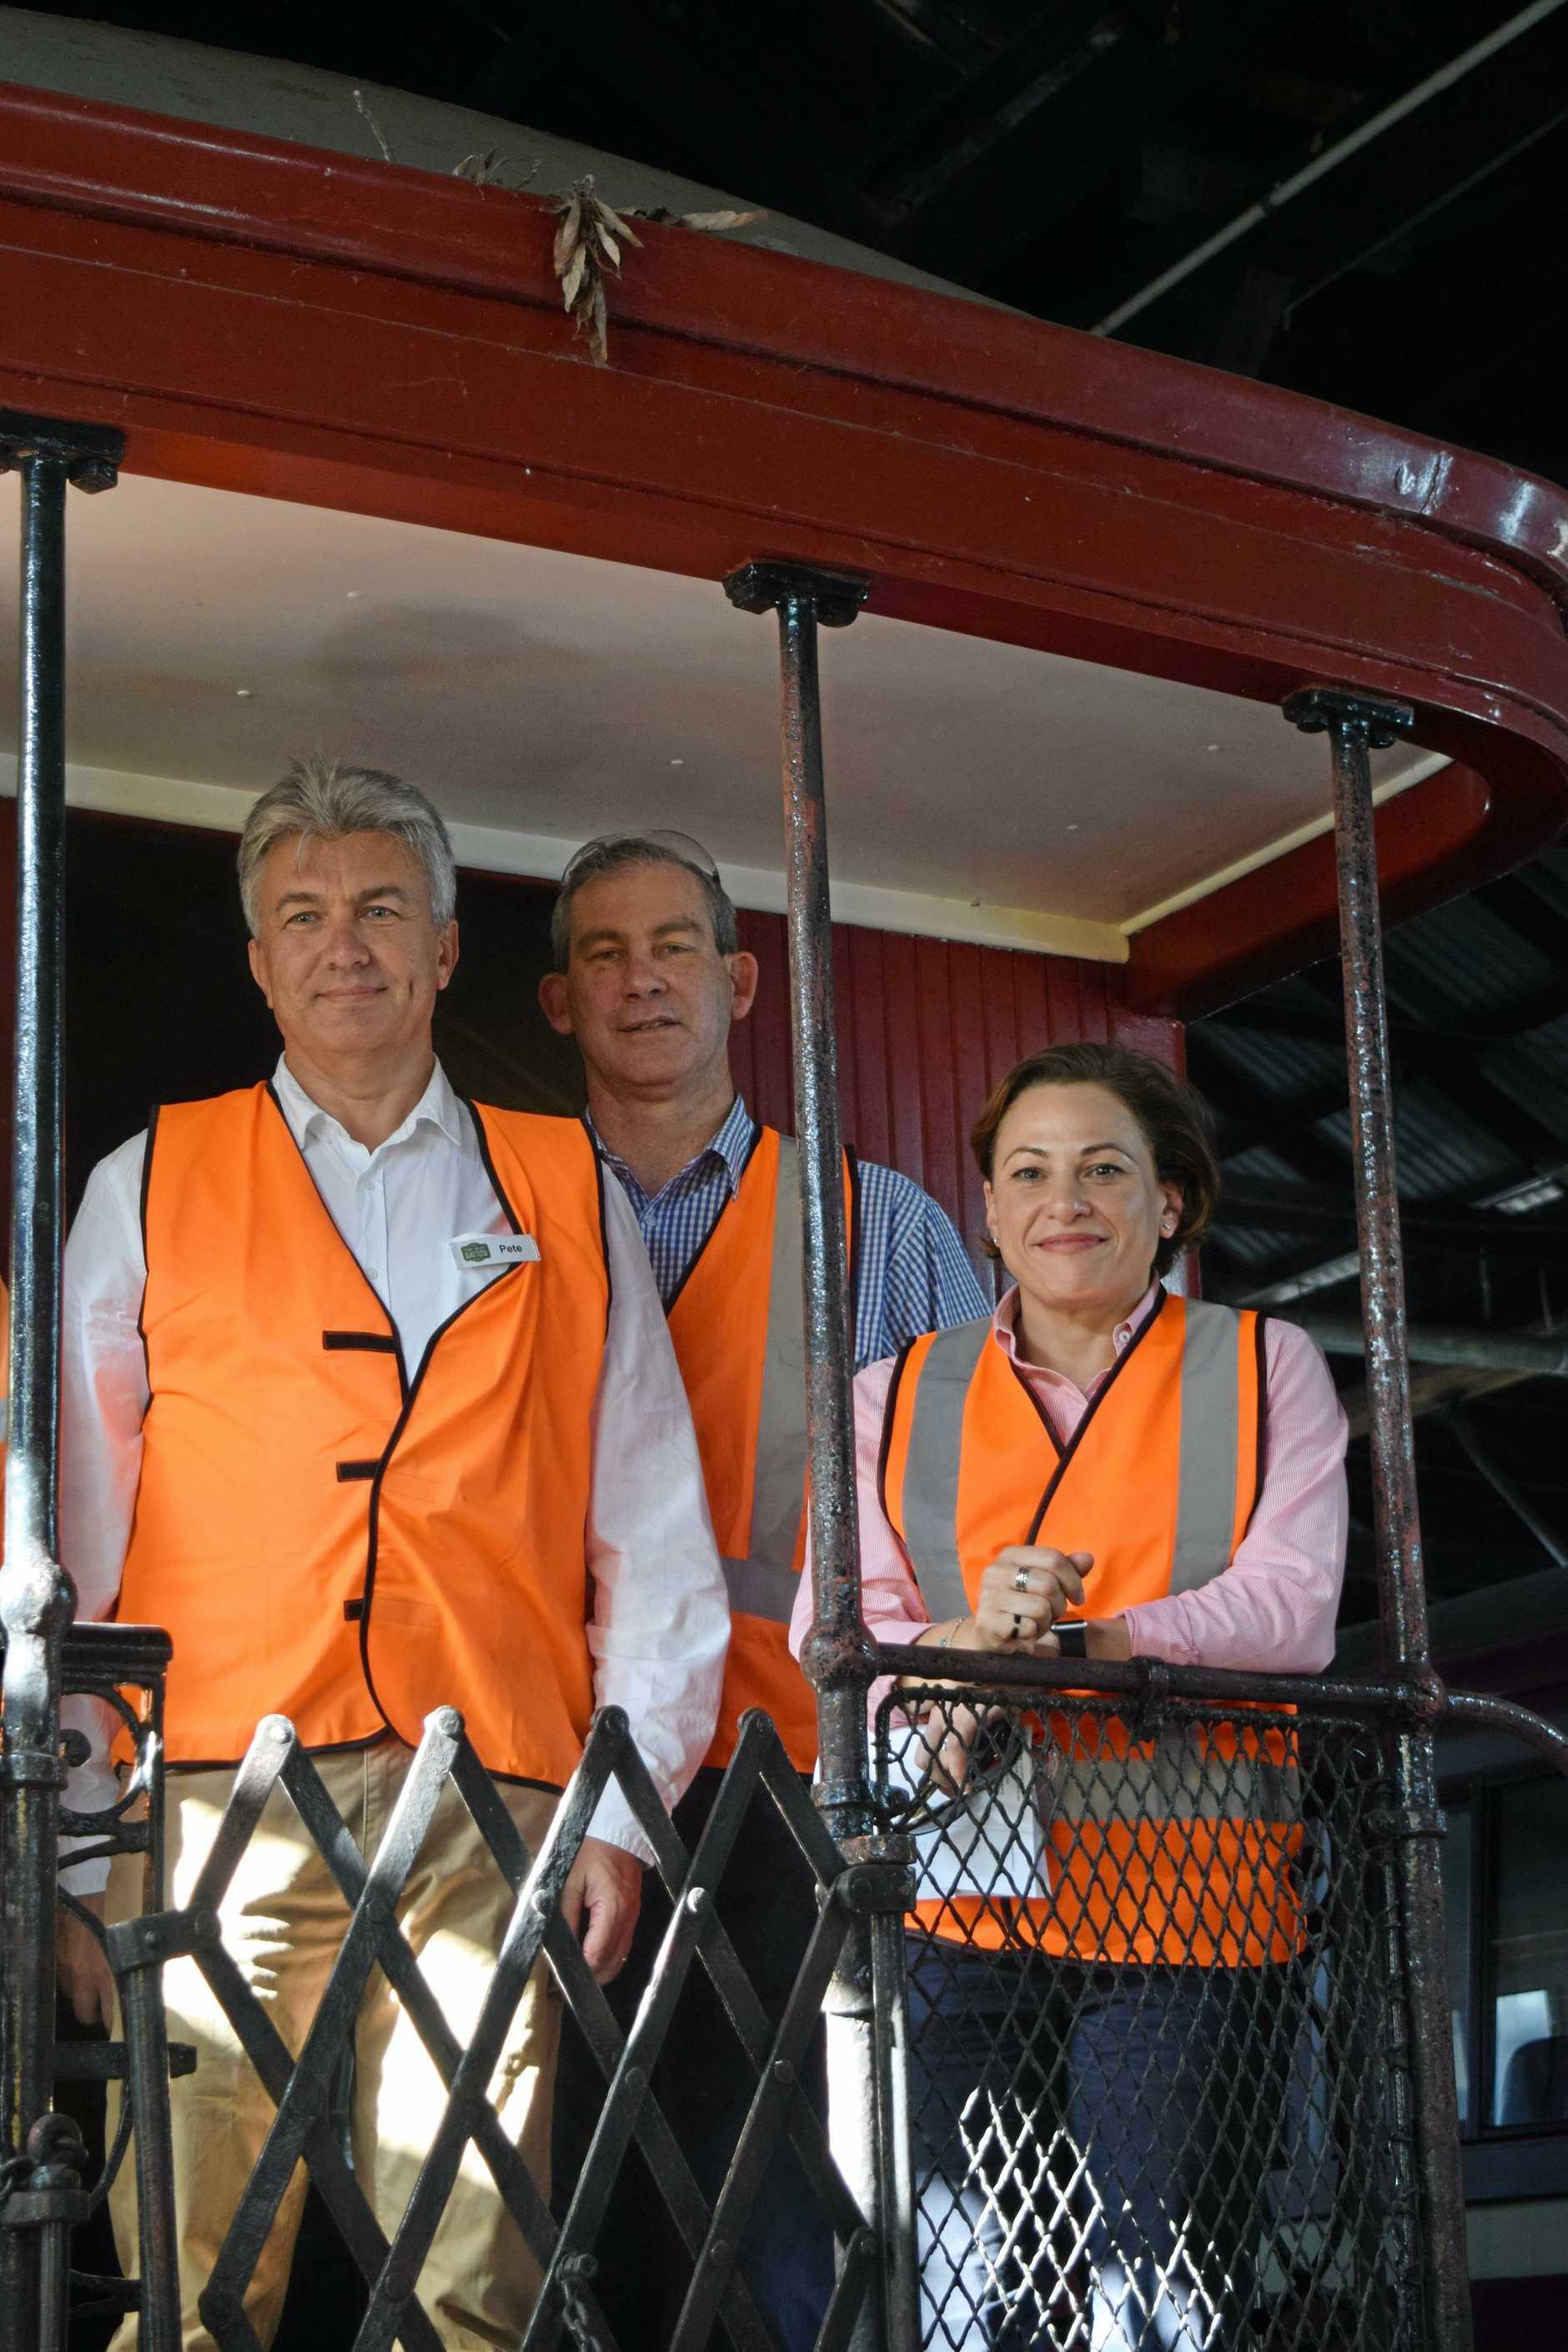 Peter Blashki, Mayor Mick Curran and Deputy Premier Jackie Trad at the Mary Valley Rattler workshop.